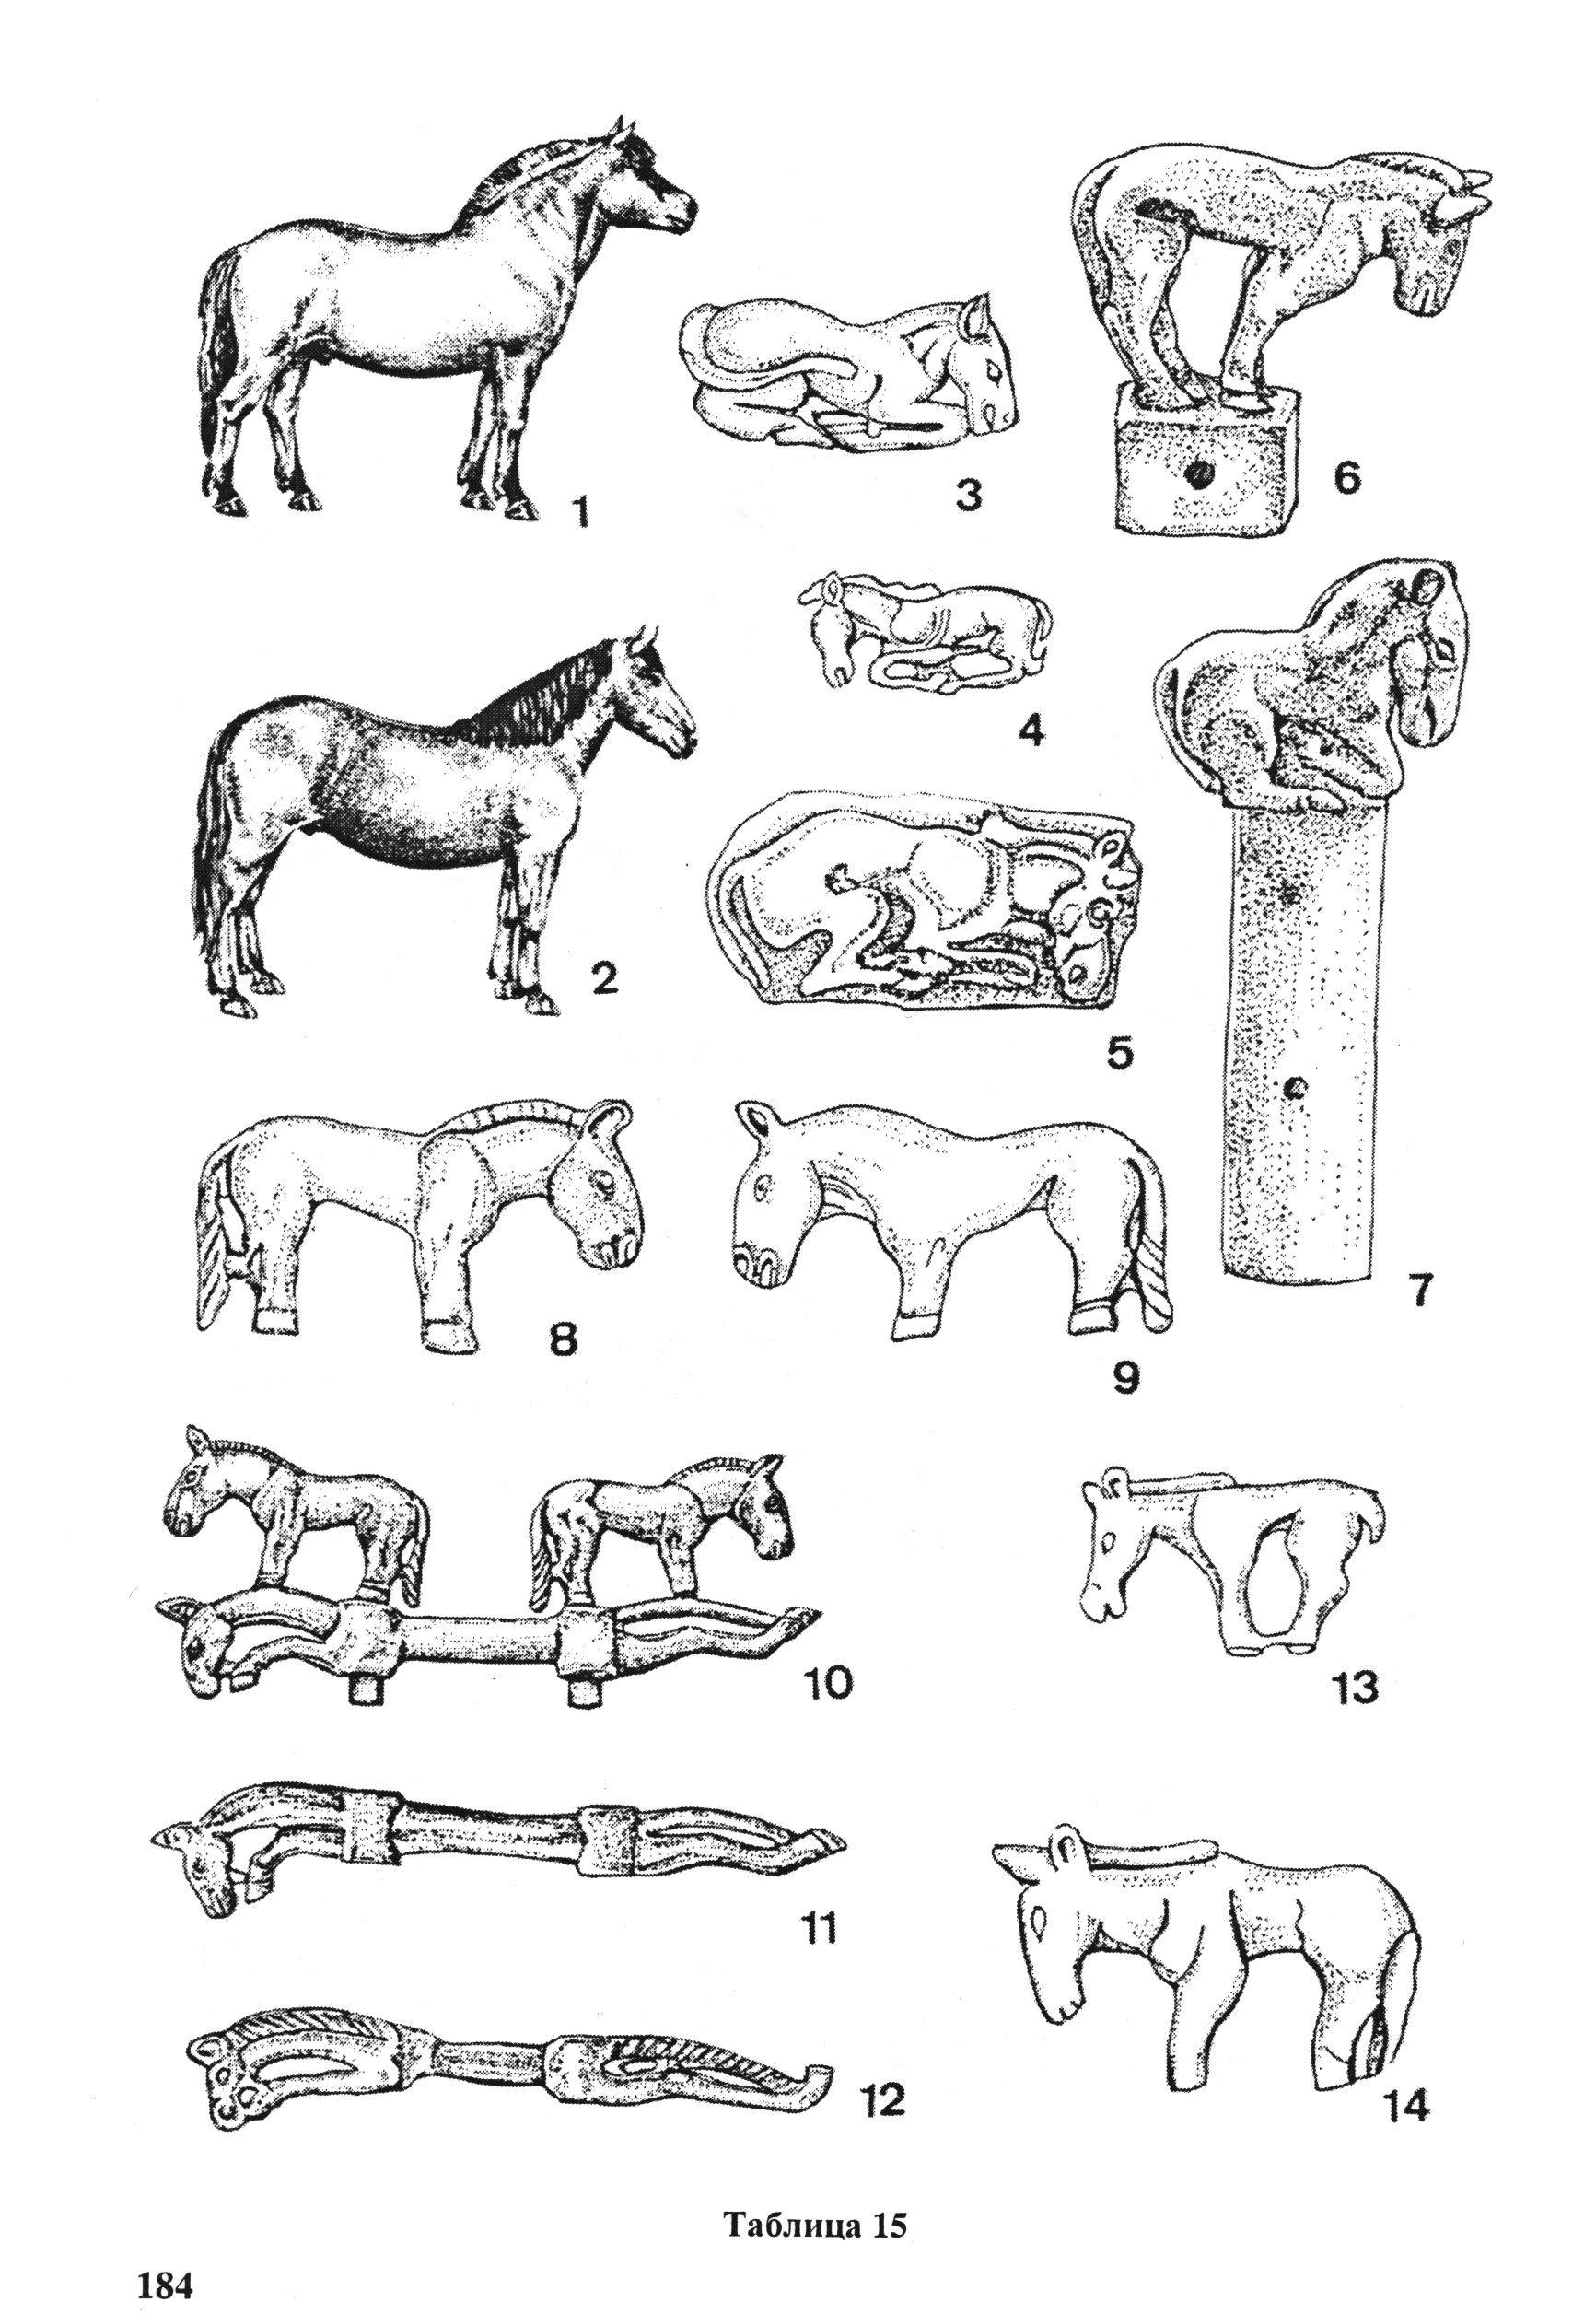 Pin By Krisztian N Dr Ghiciu On Szkitak Scythians